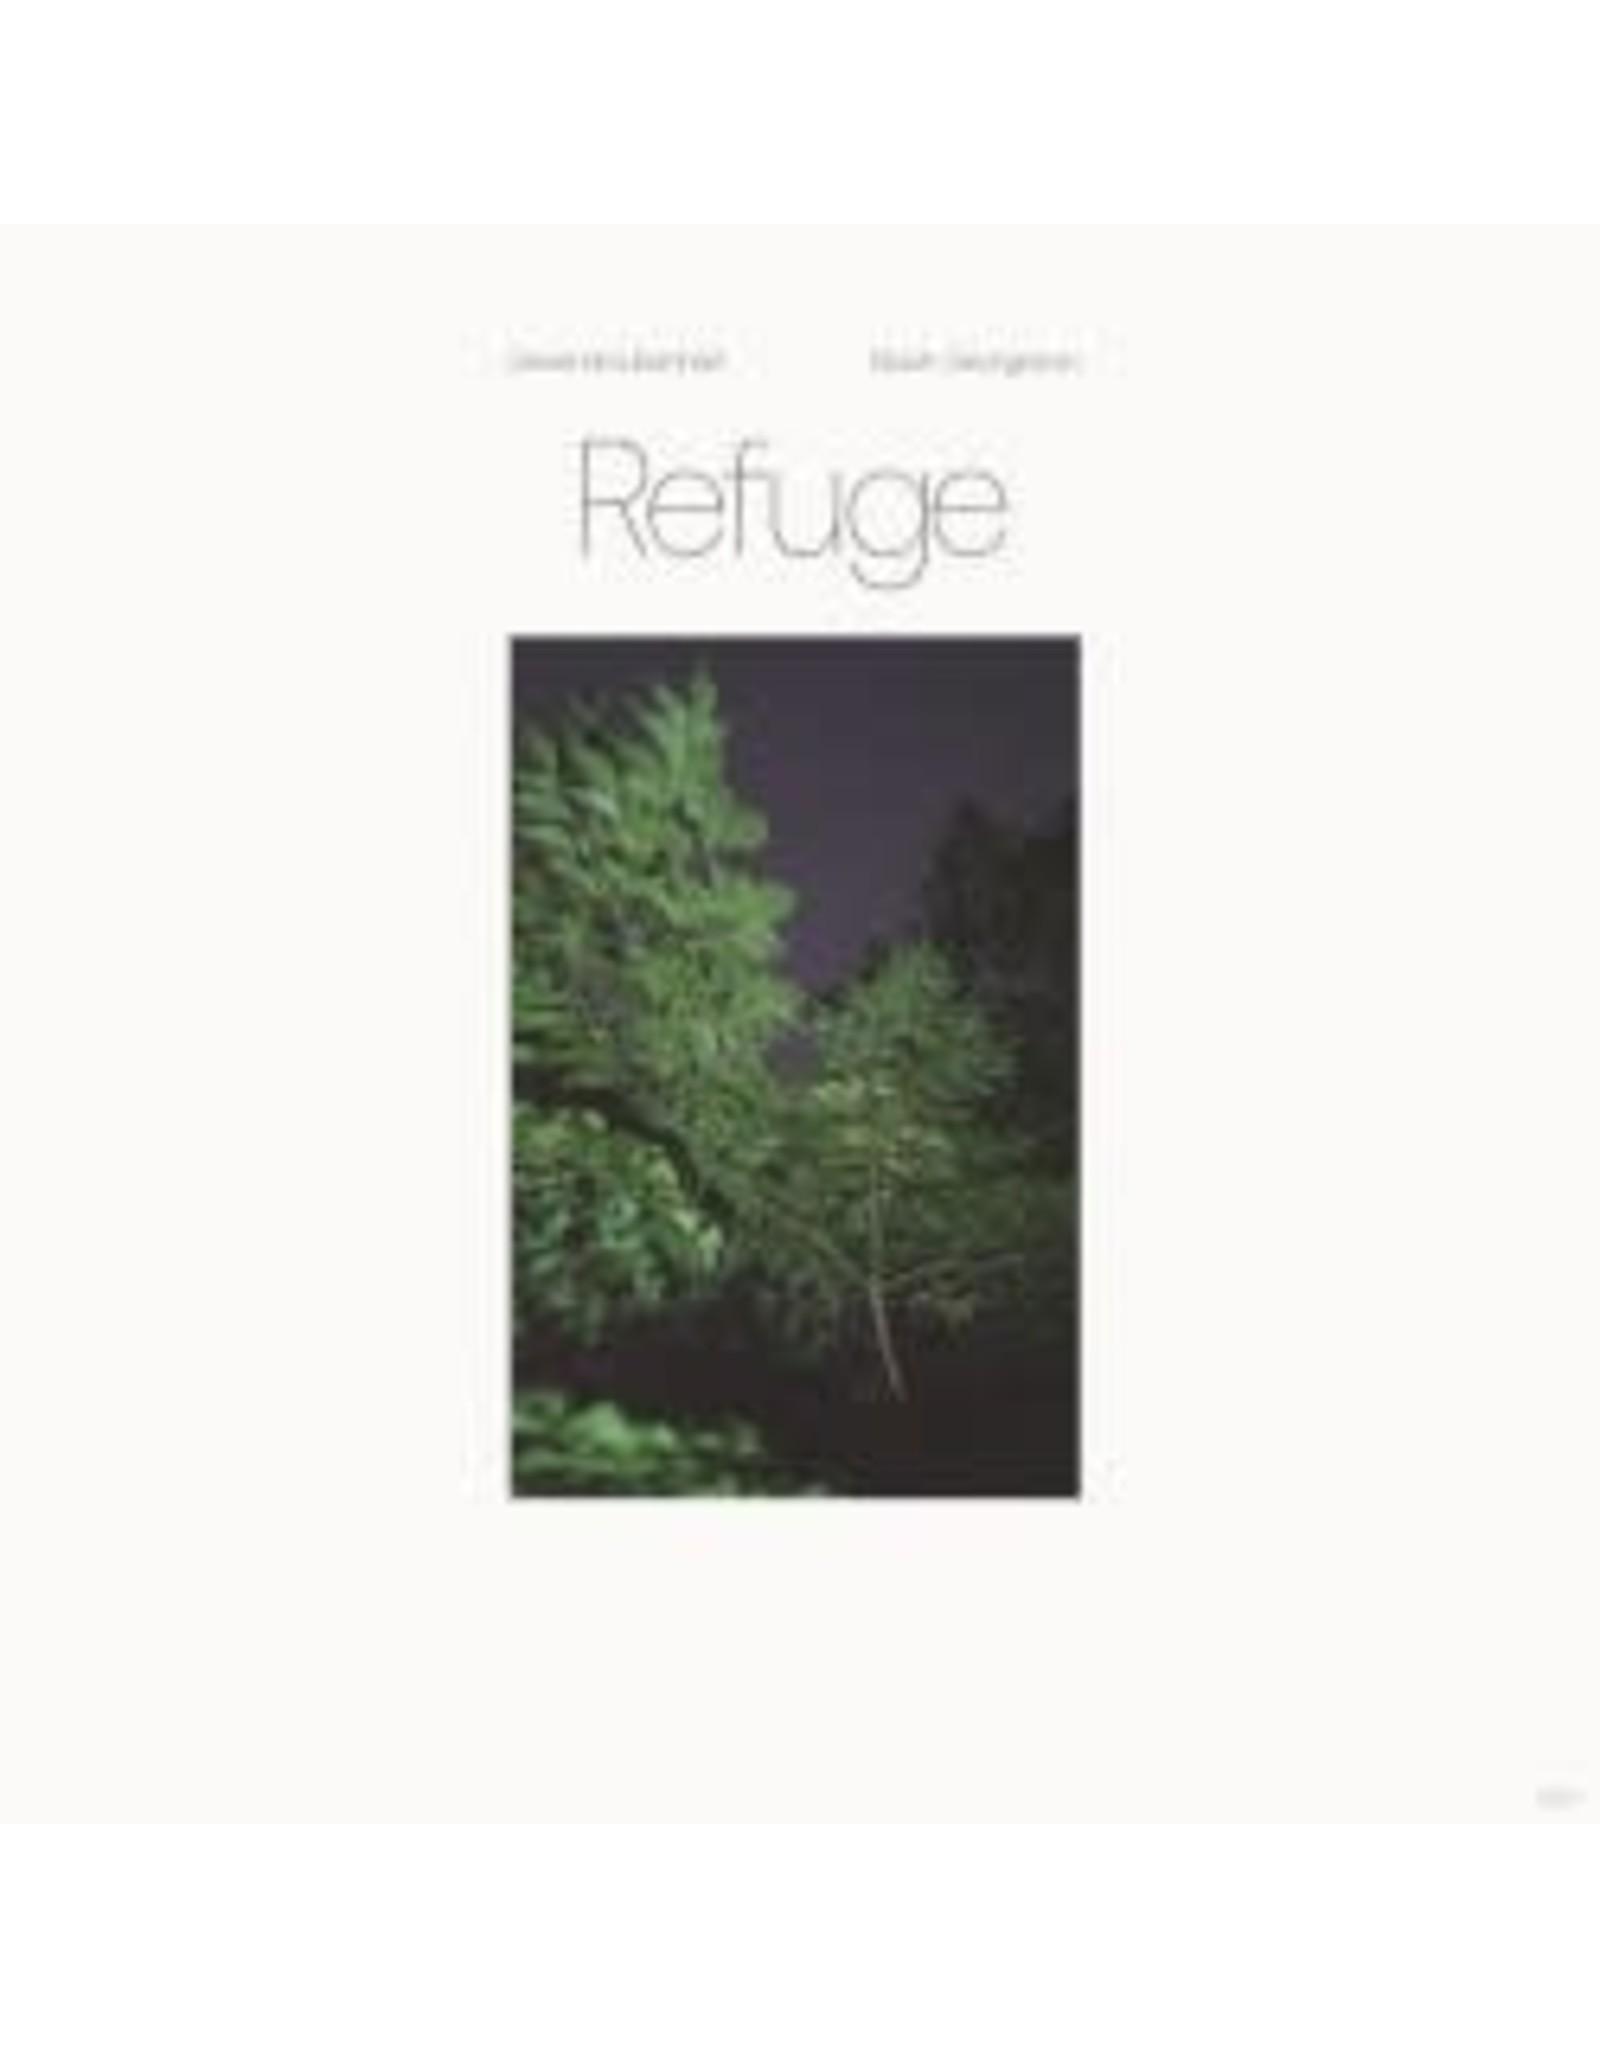 Banhart, Devendra & Georgeson, Noah - Refuge 2LP (blue seaglass wave translucent vinyl)